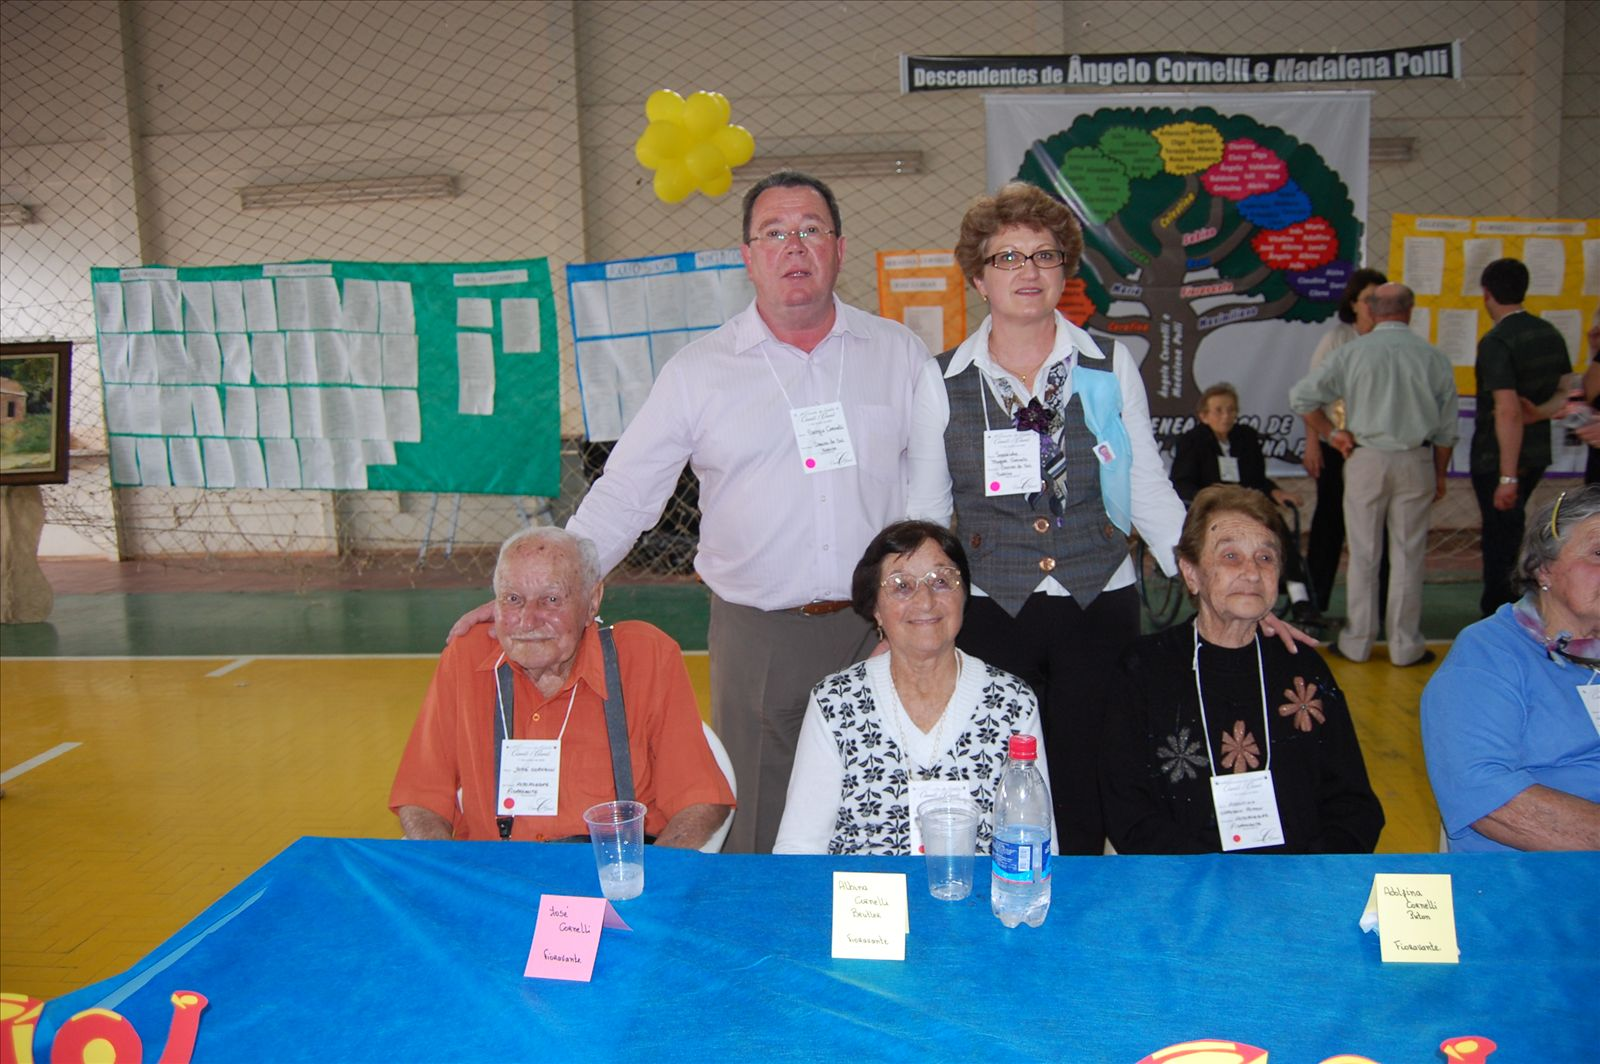 2º Encontro Família Cornelli - 11.10.2009 (210)_0